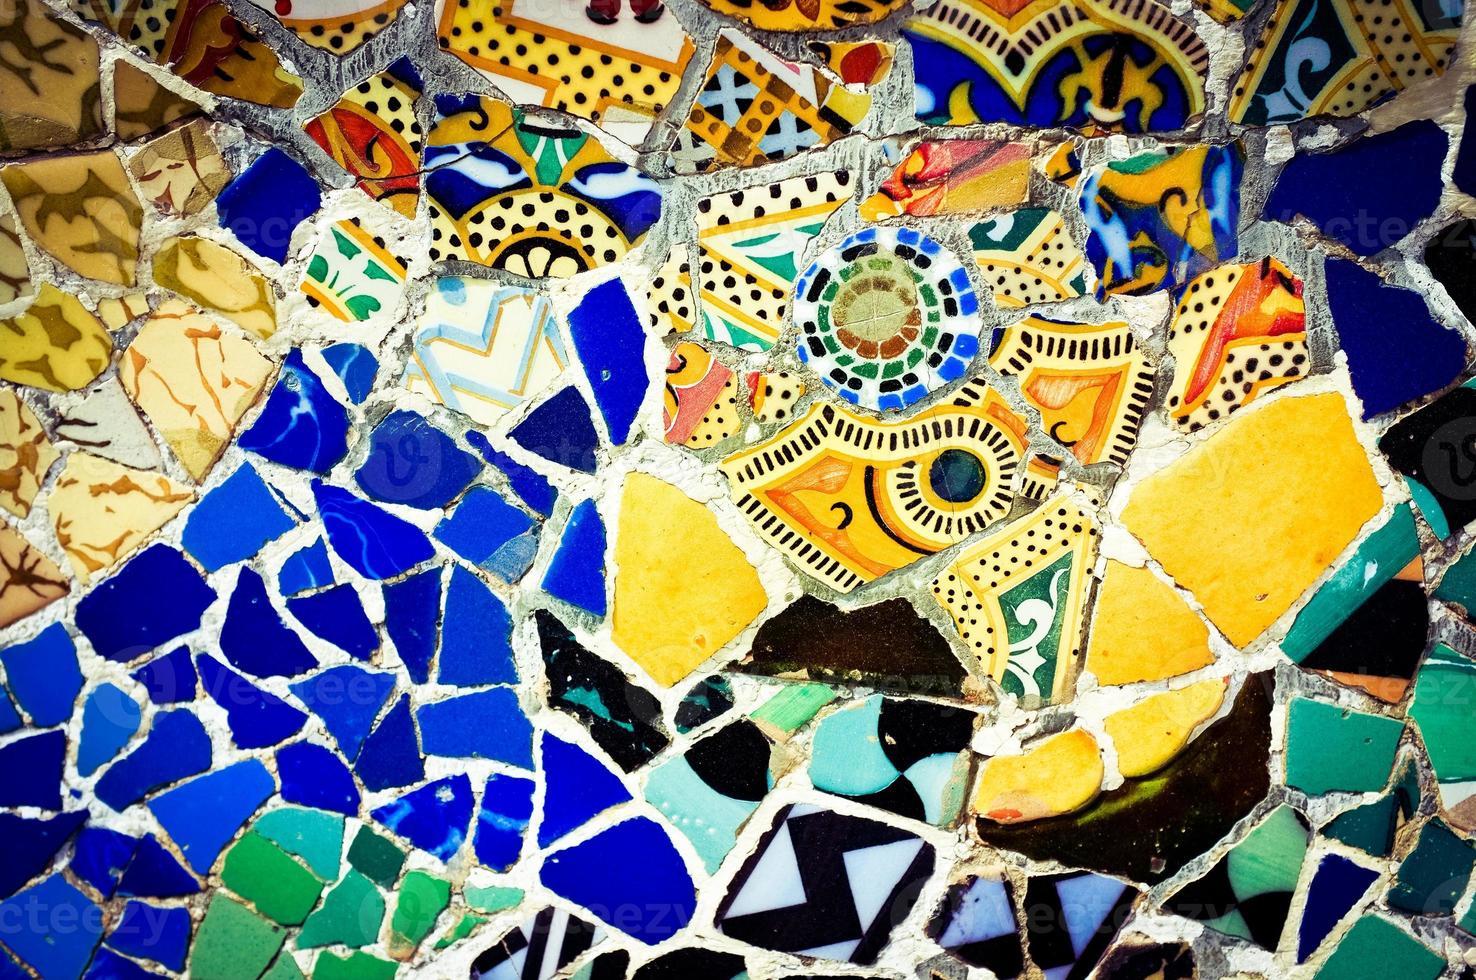 parque guell, mosaico, plano de fondo foto